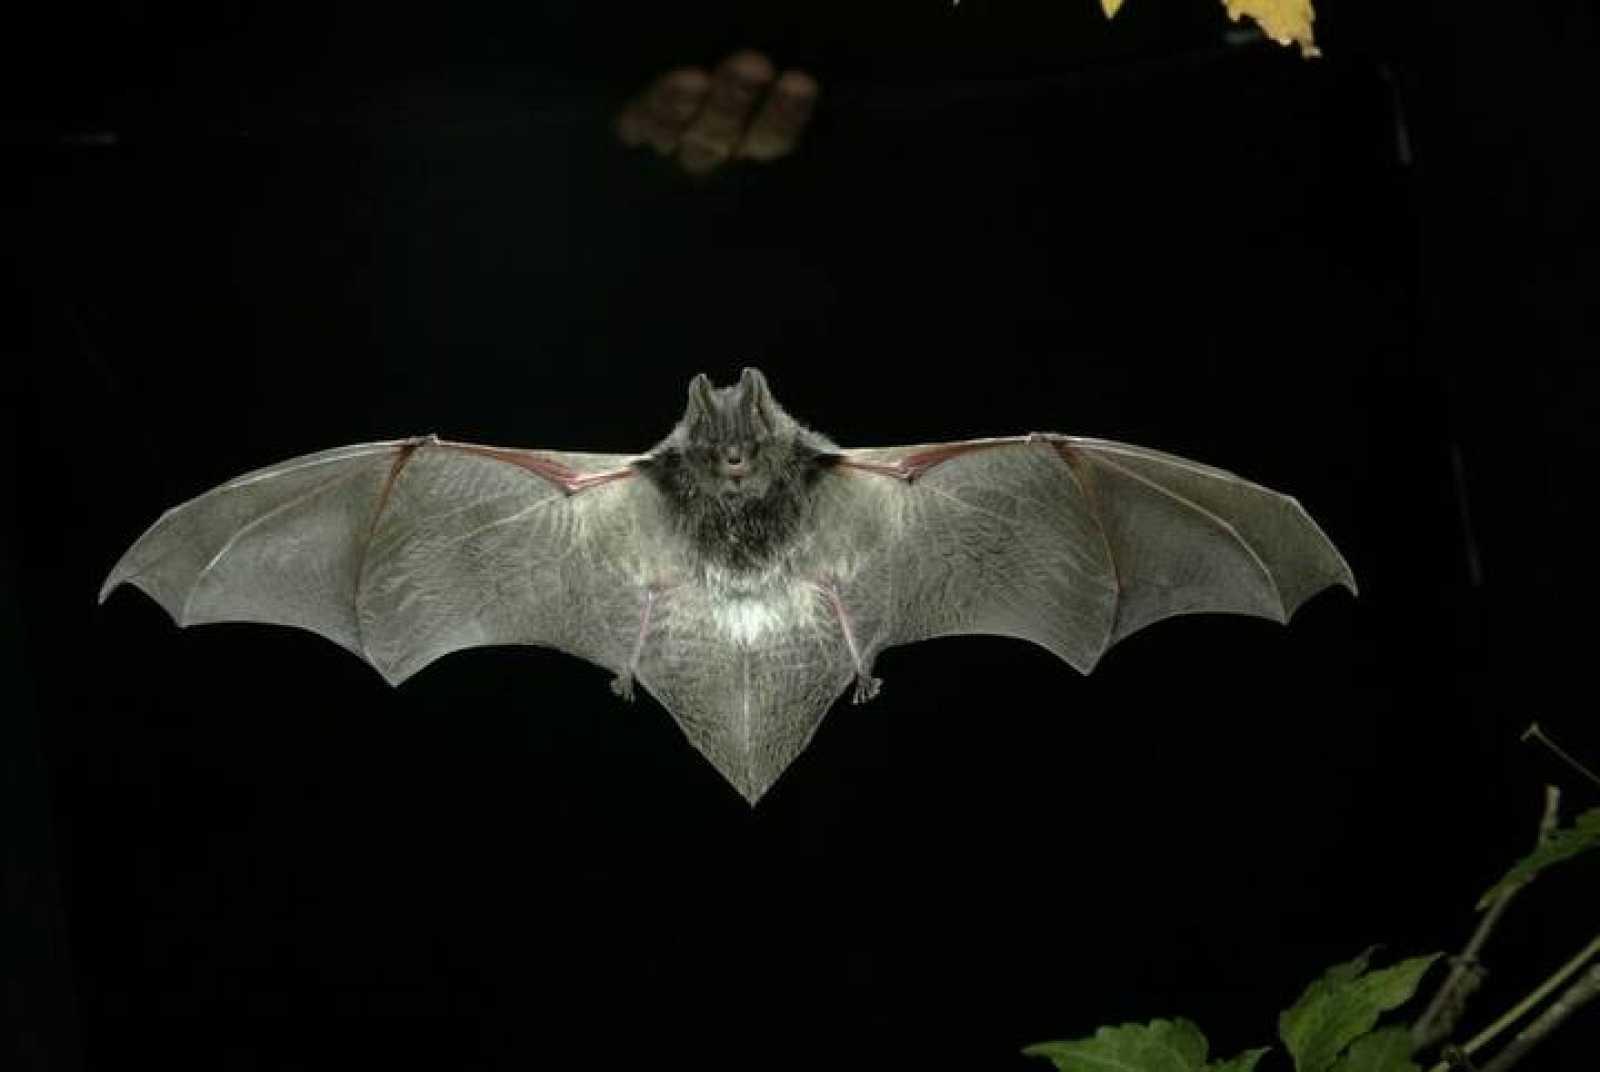 El murciélago 'Barbastella' (Barbastella barbastellus) en pleno vuelo